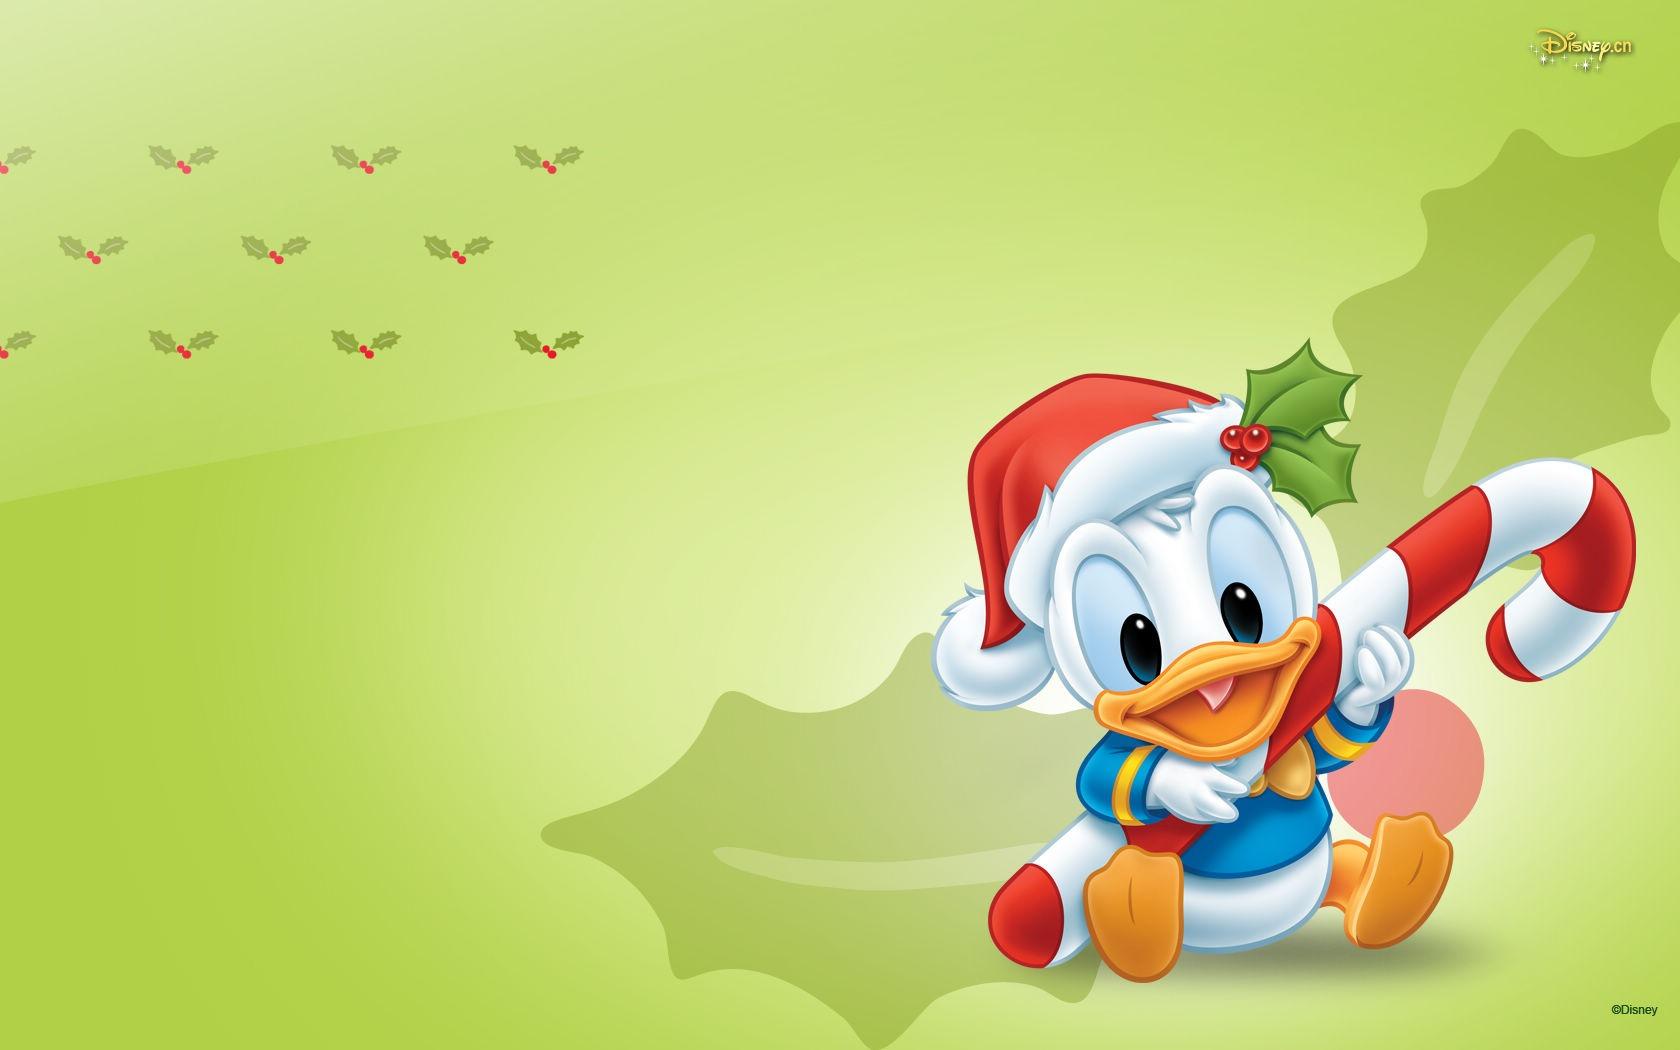 HD Cartoon Wallpapers For Desktop Group (95+)